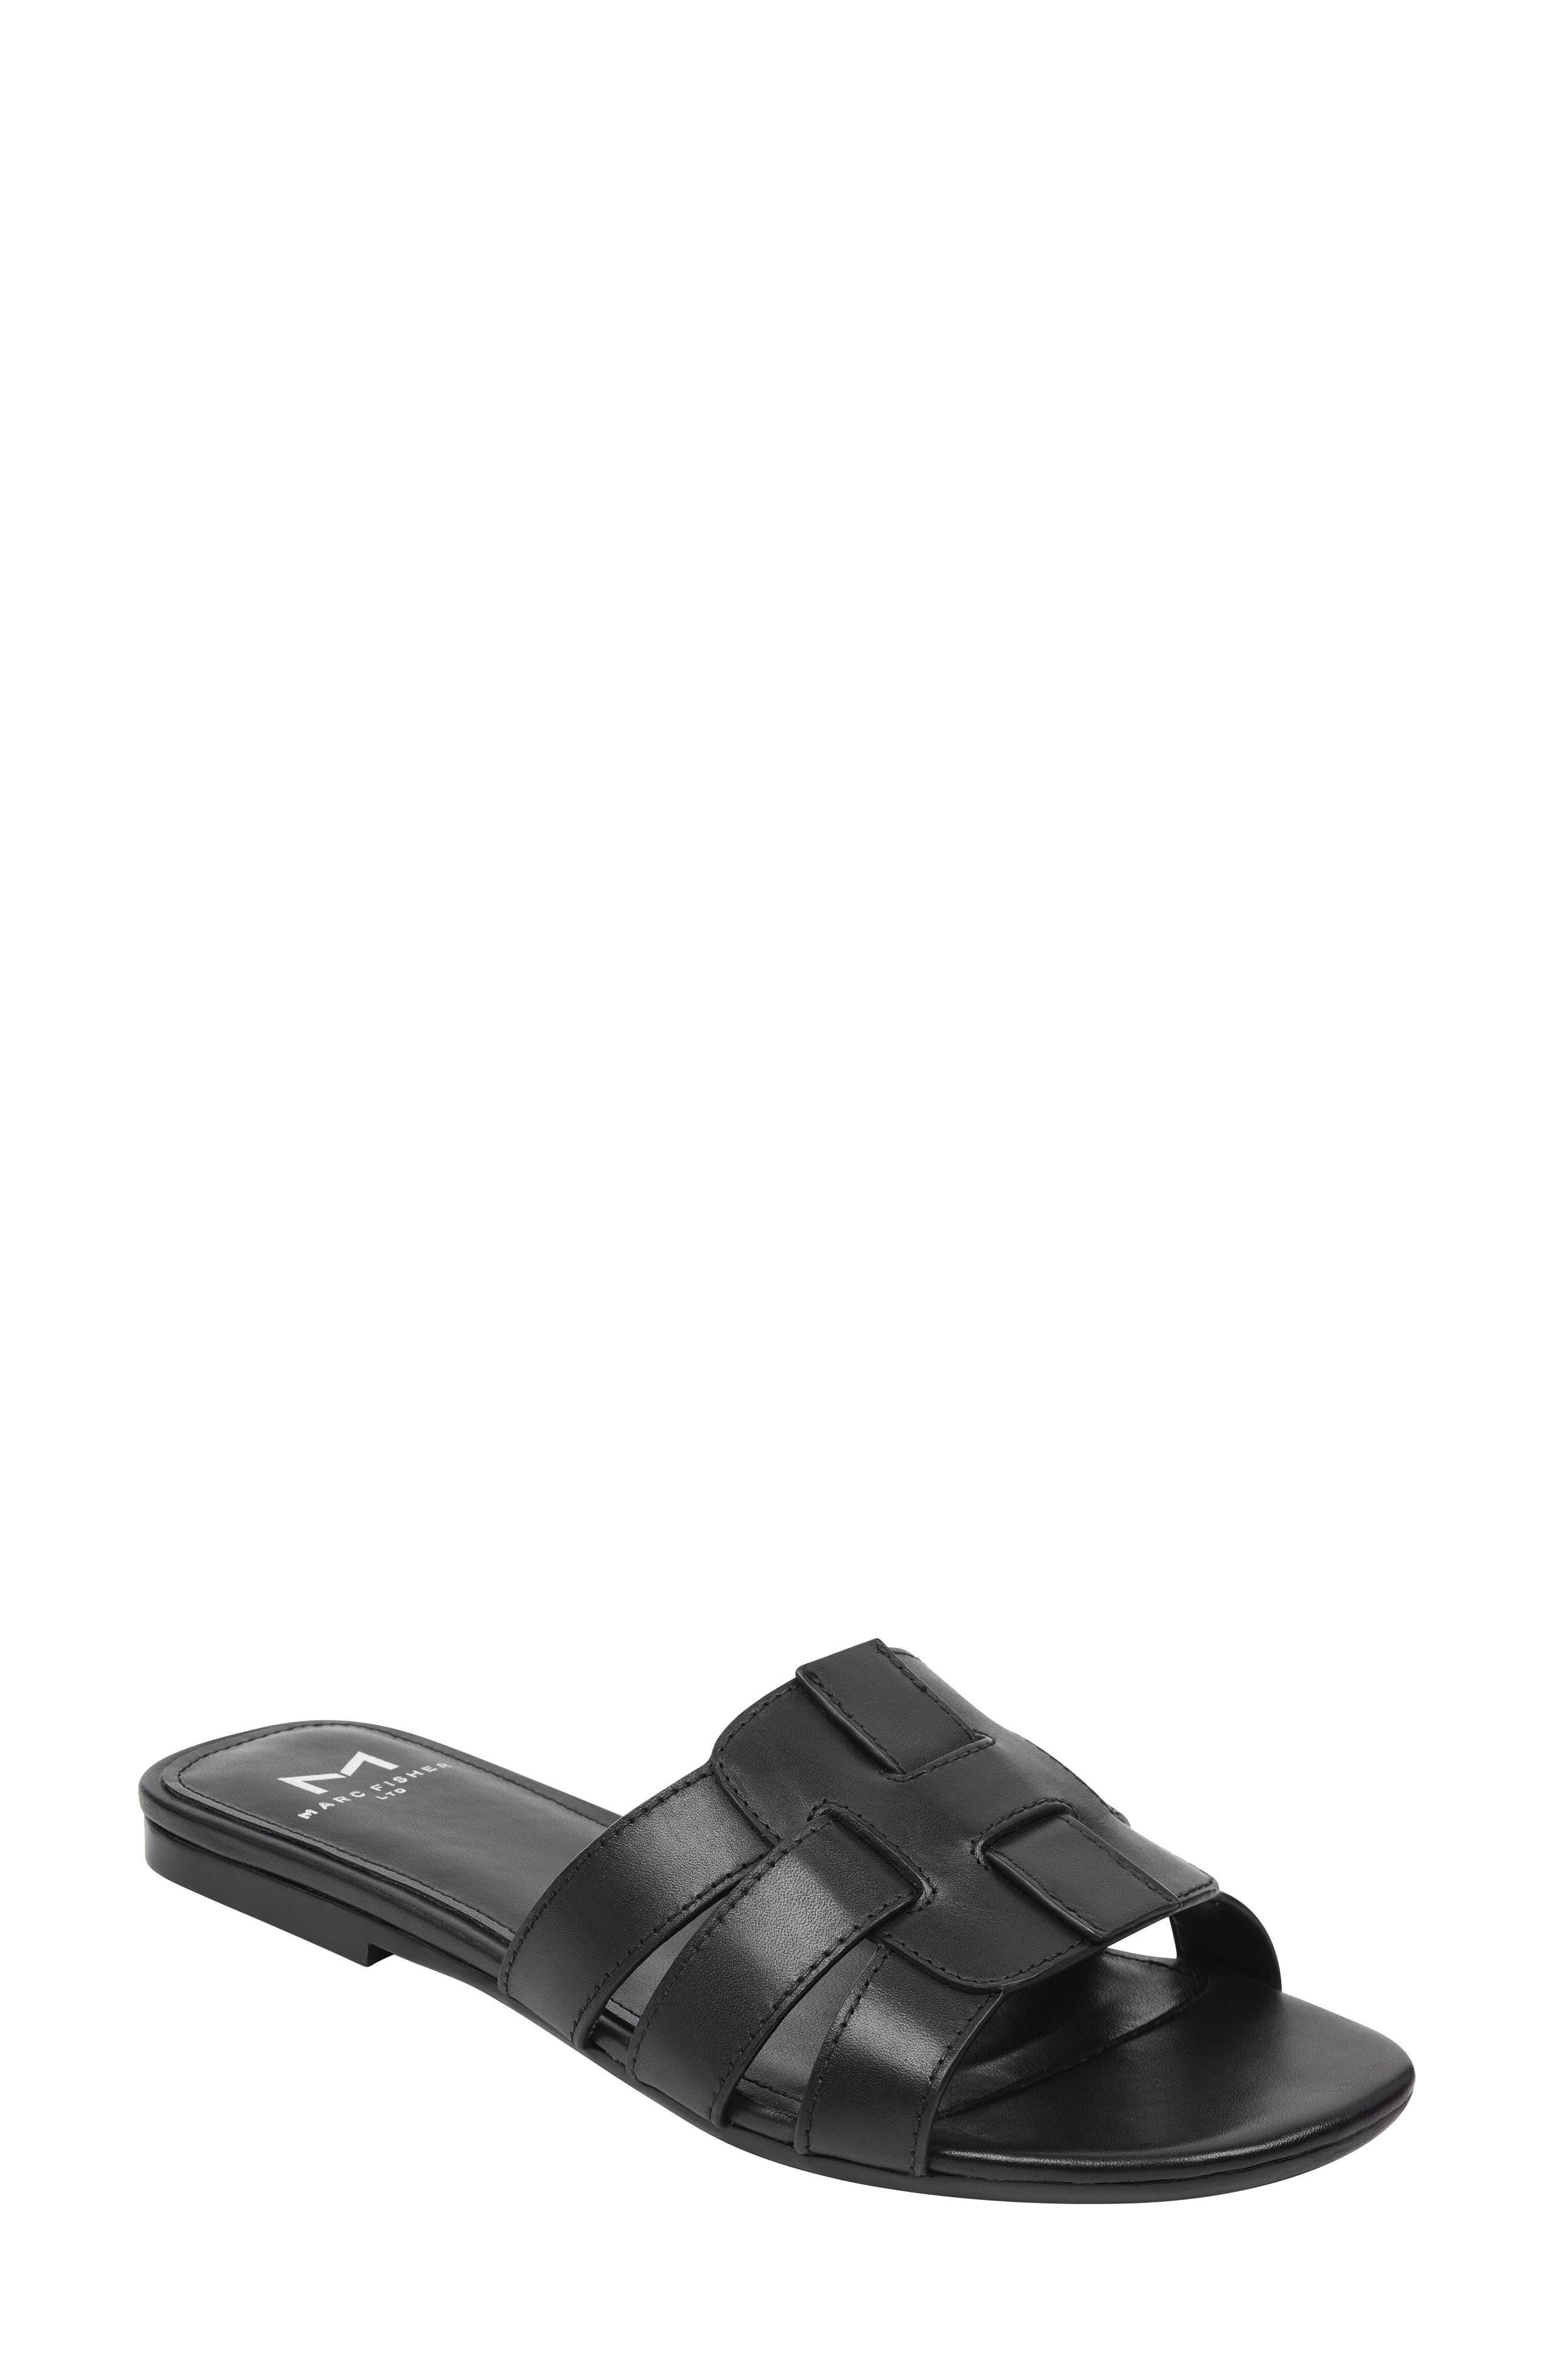 Kayli Slide Sandal, Main, color, BLACK LEATHER LEATHER